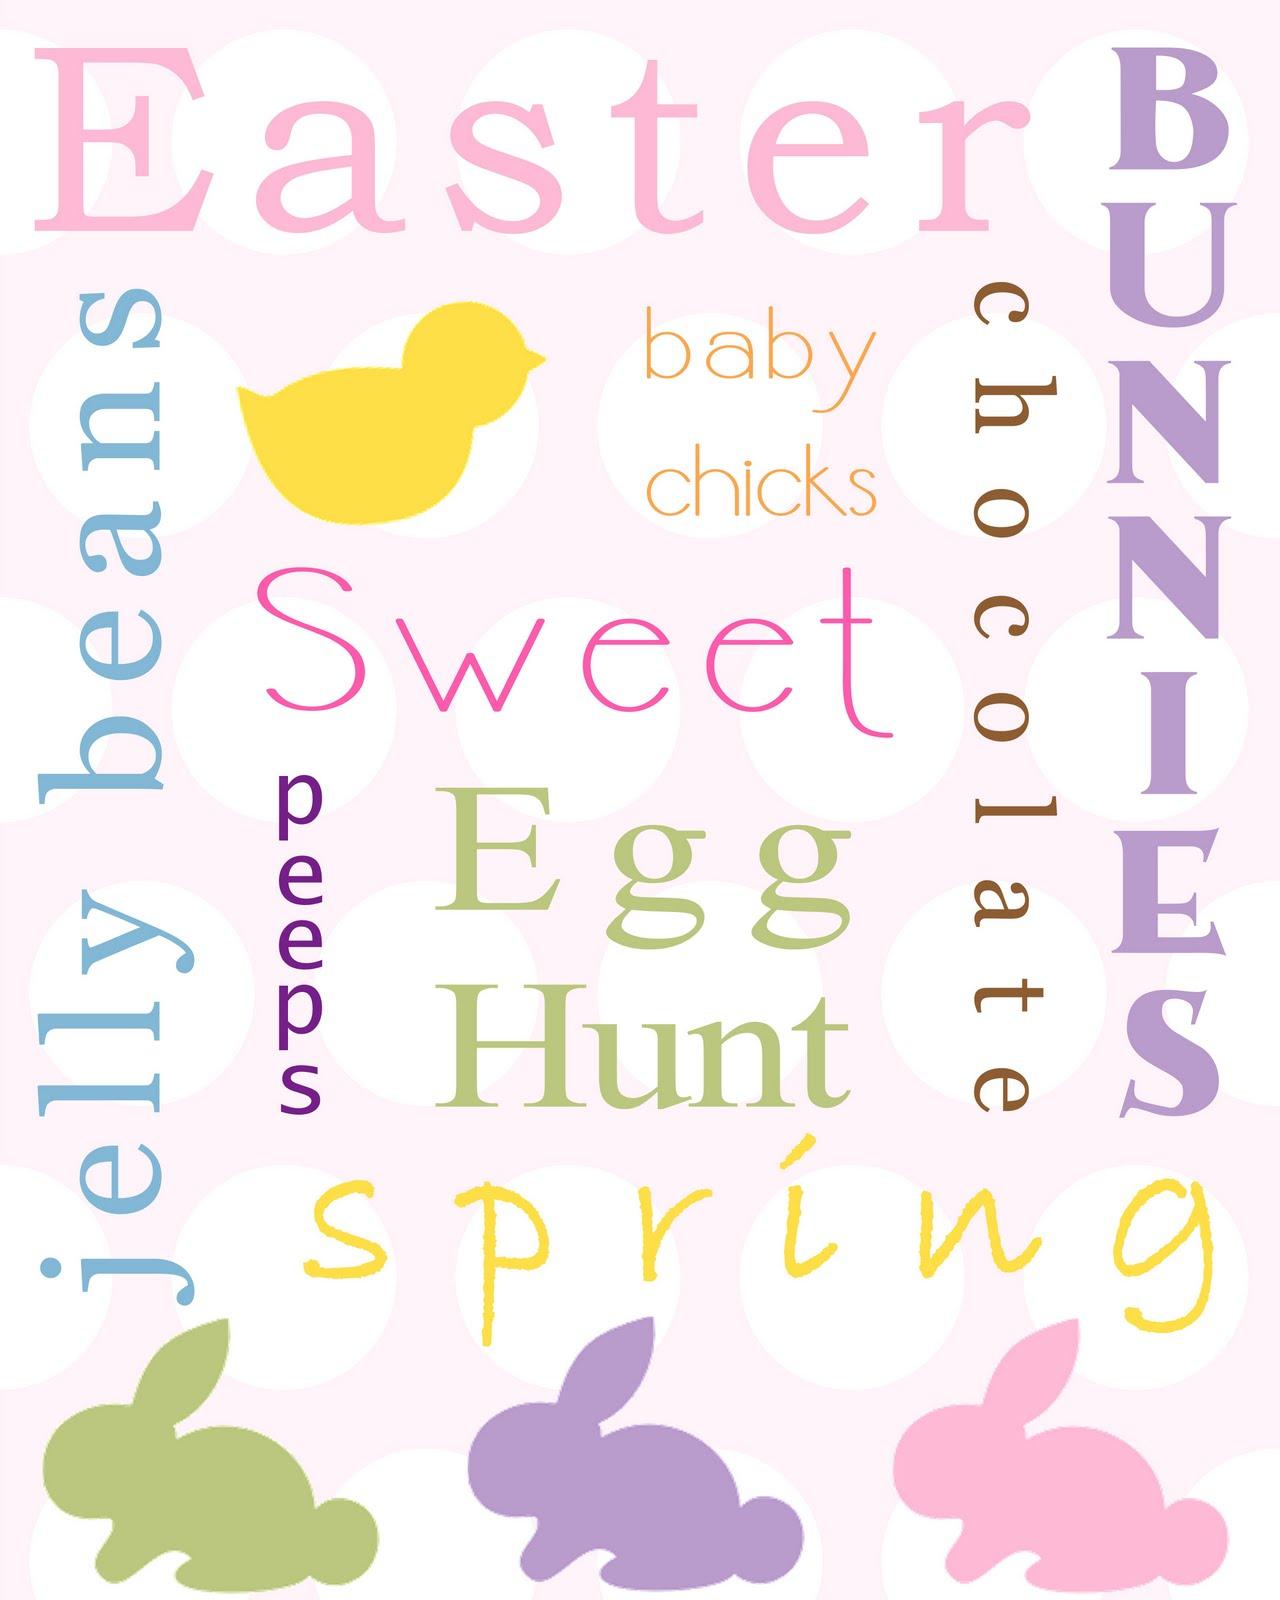 Easter Things: Sweet And Simple Things: Free Easter Printables